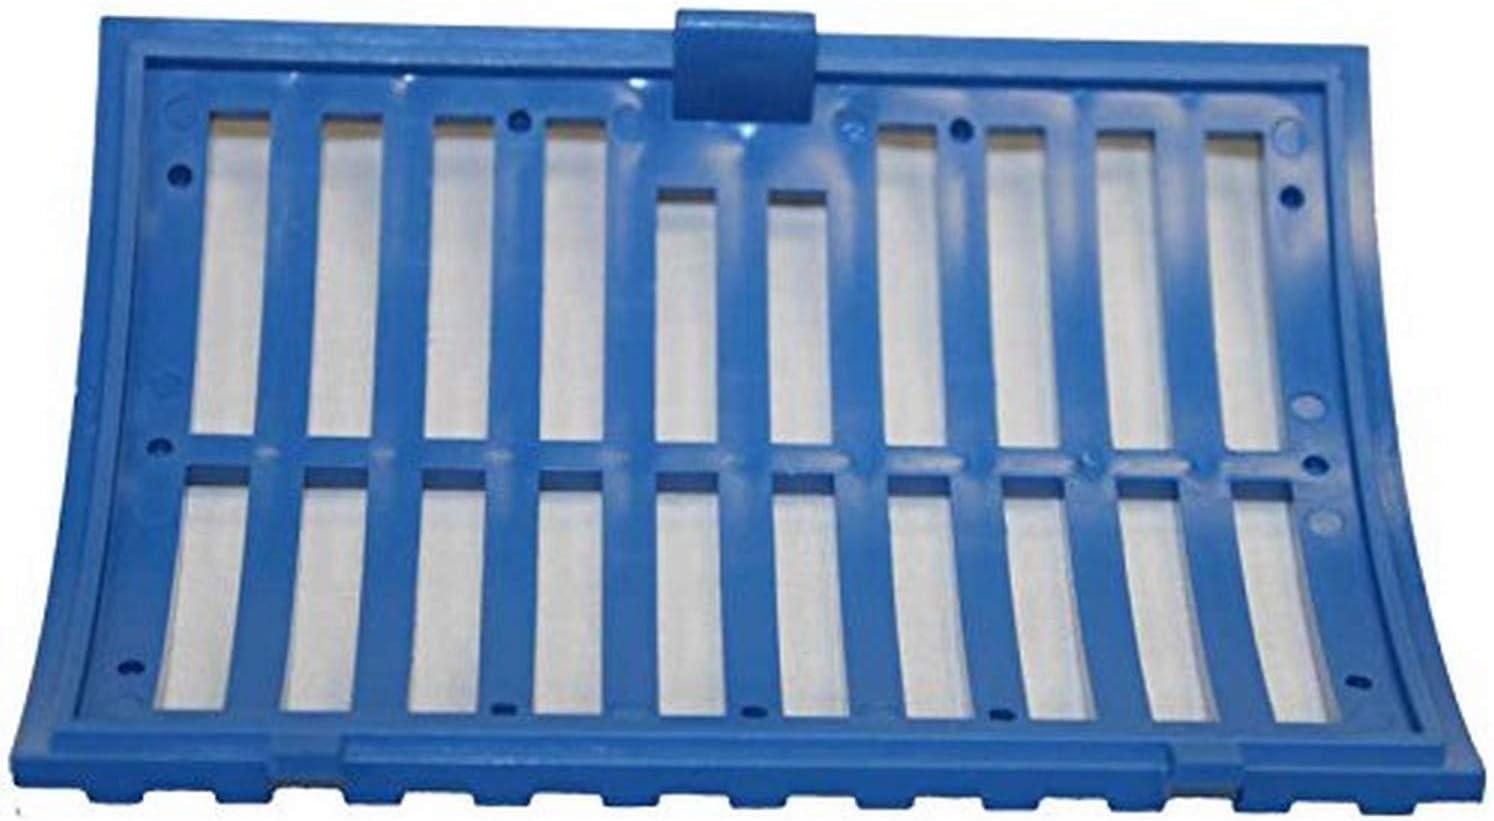 Karcher 8.614-141.0 Cover, Blue Plastic Exhaust Filter Xp 12/15/18